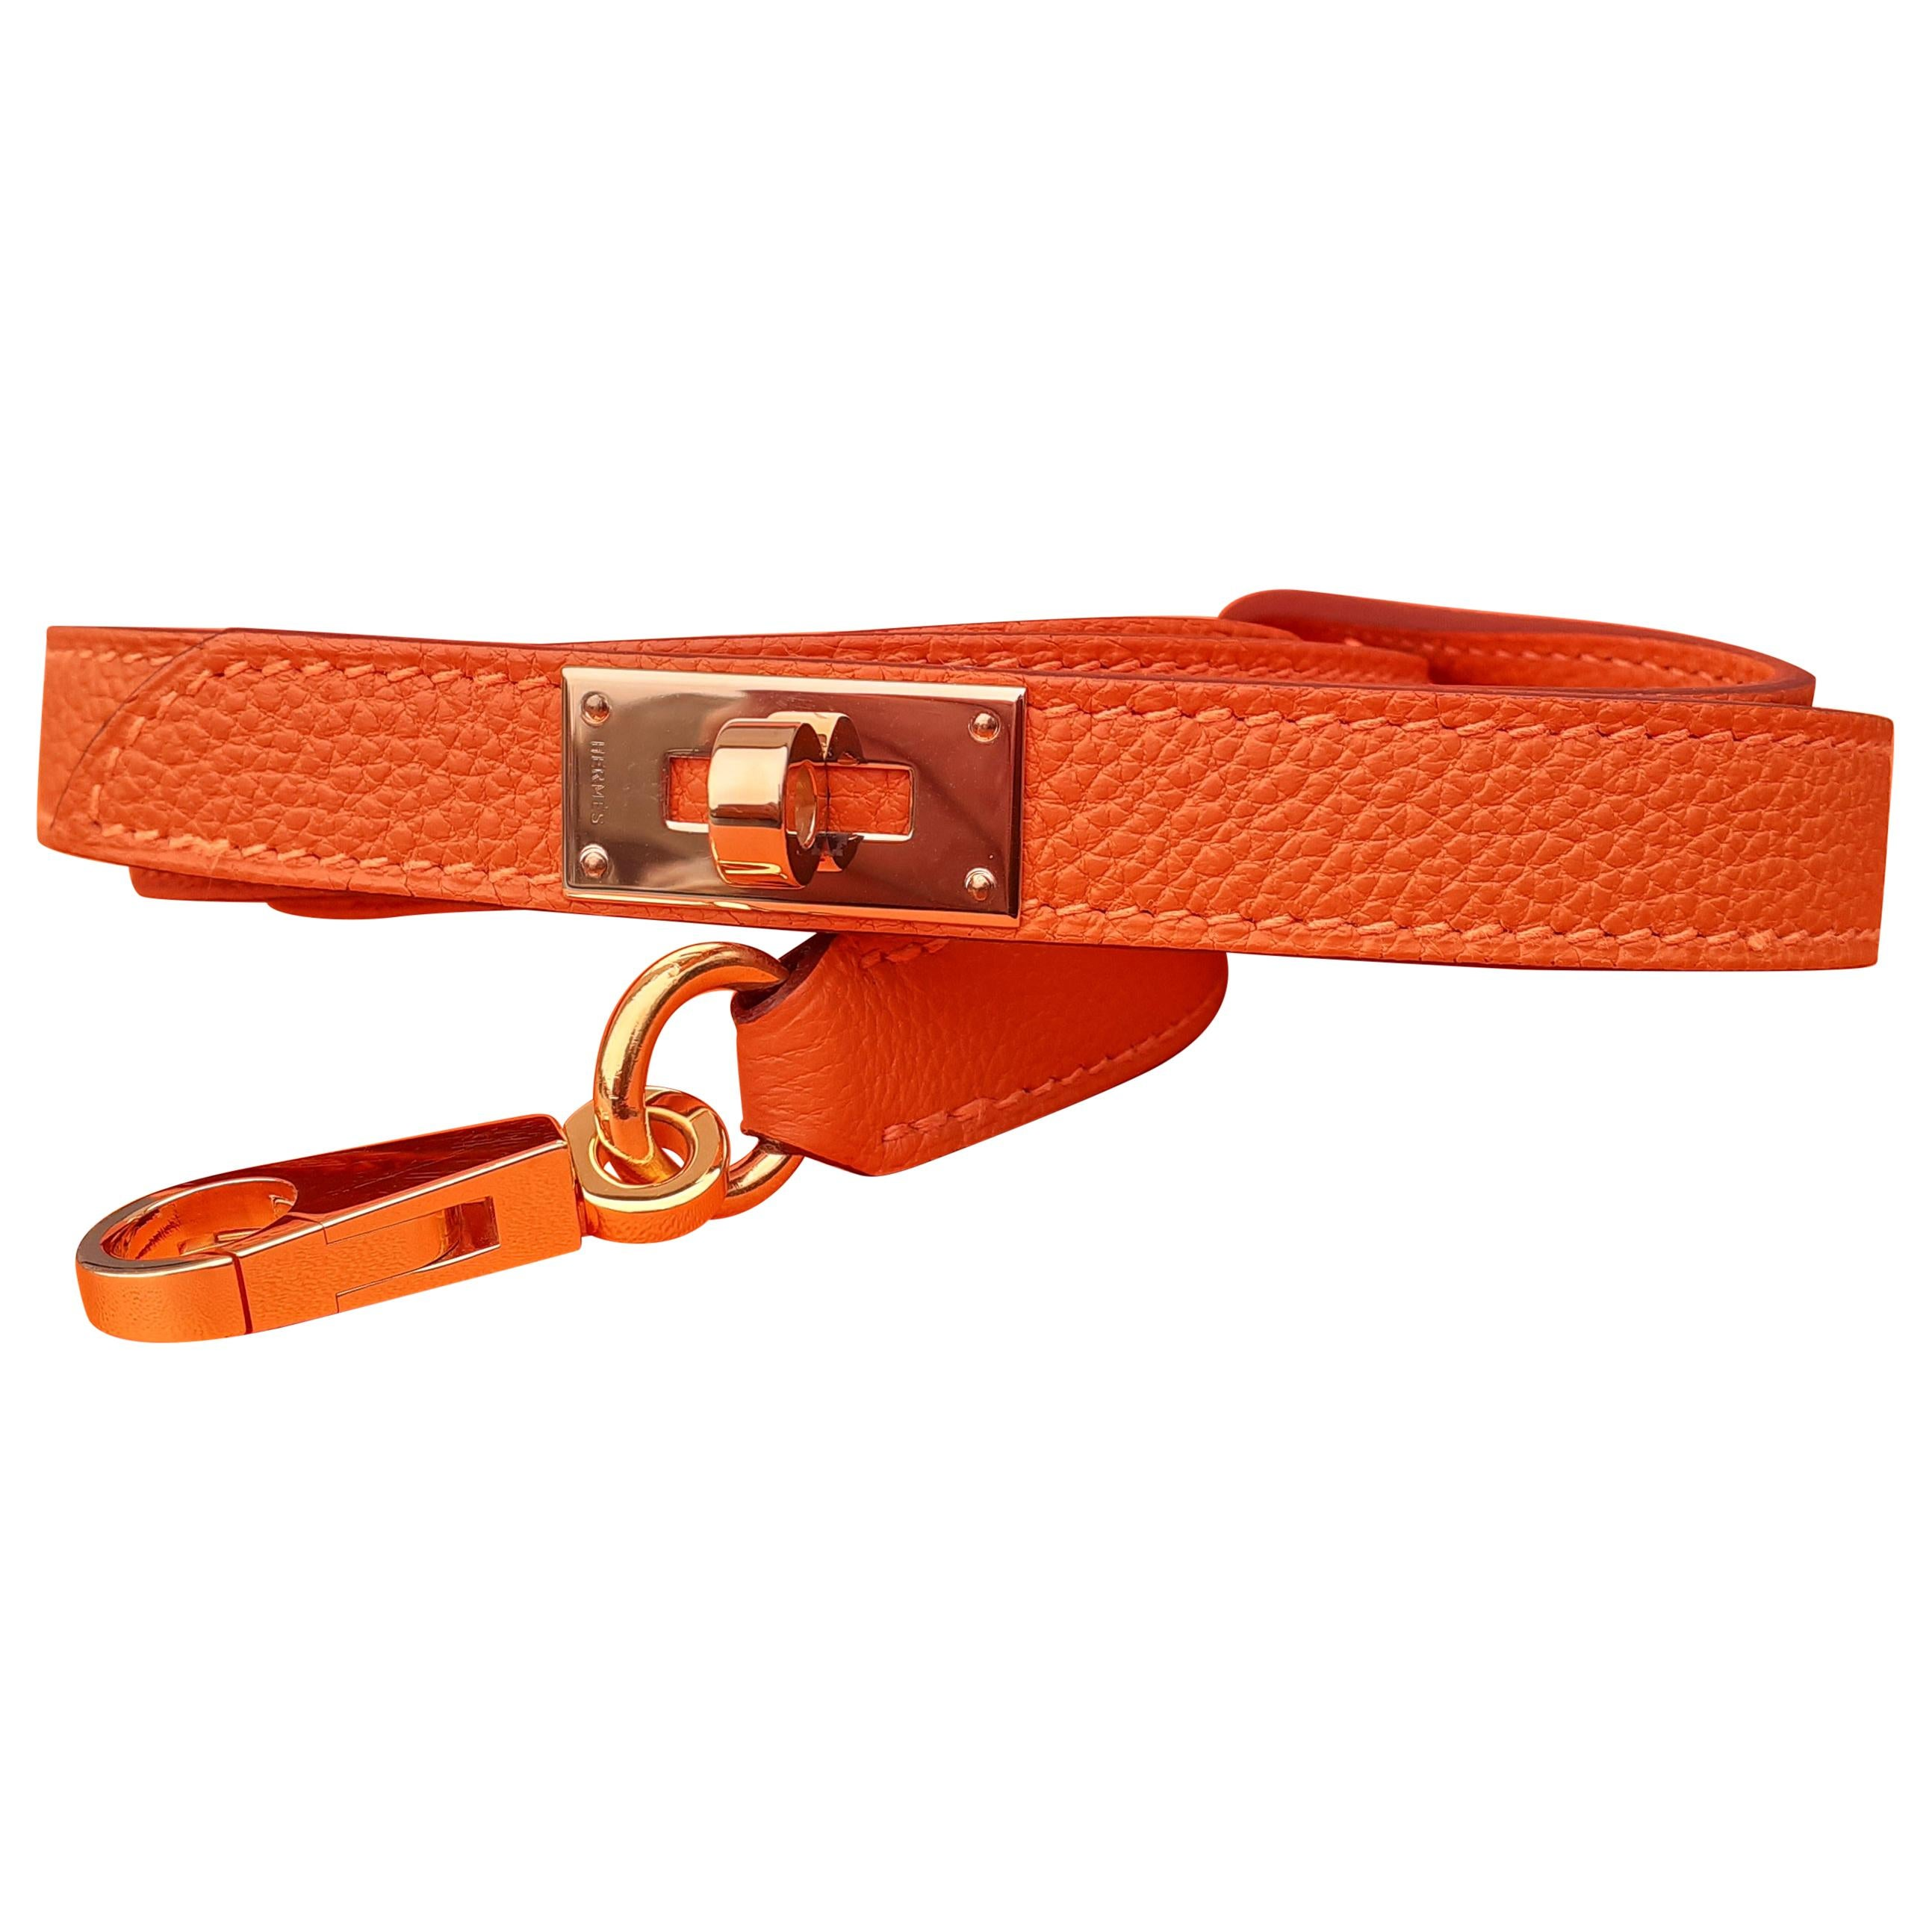 Exceptional Hermès Dog Leash Kelly Pattern Orange Leather Gold Hdw